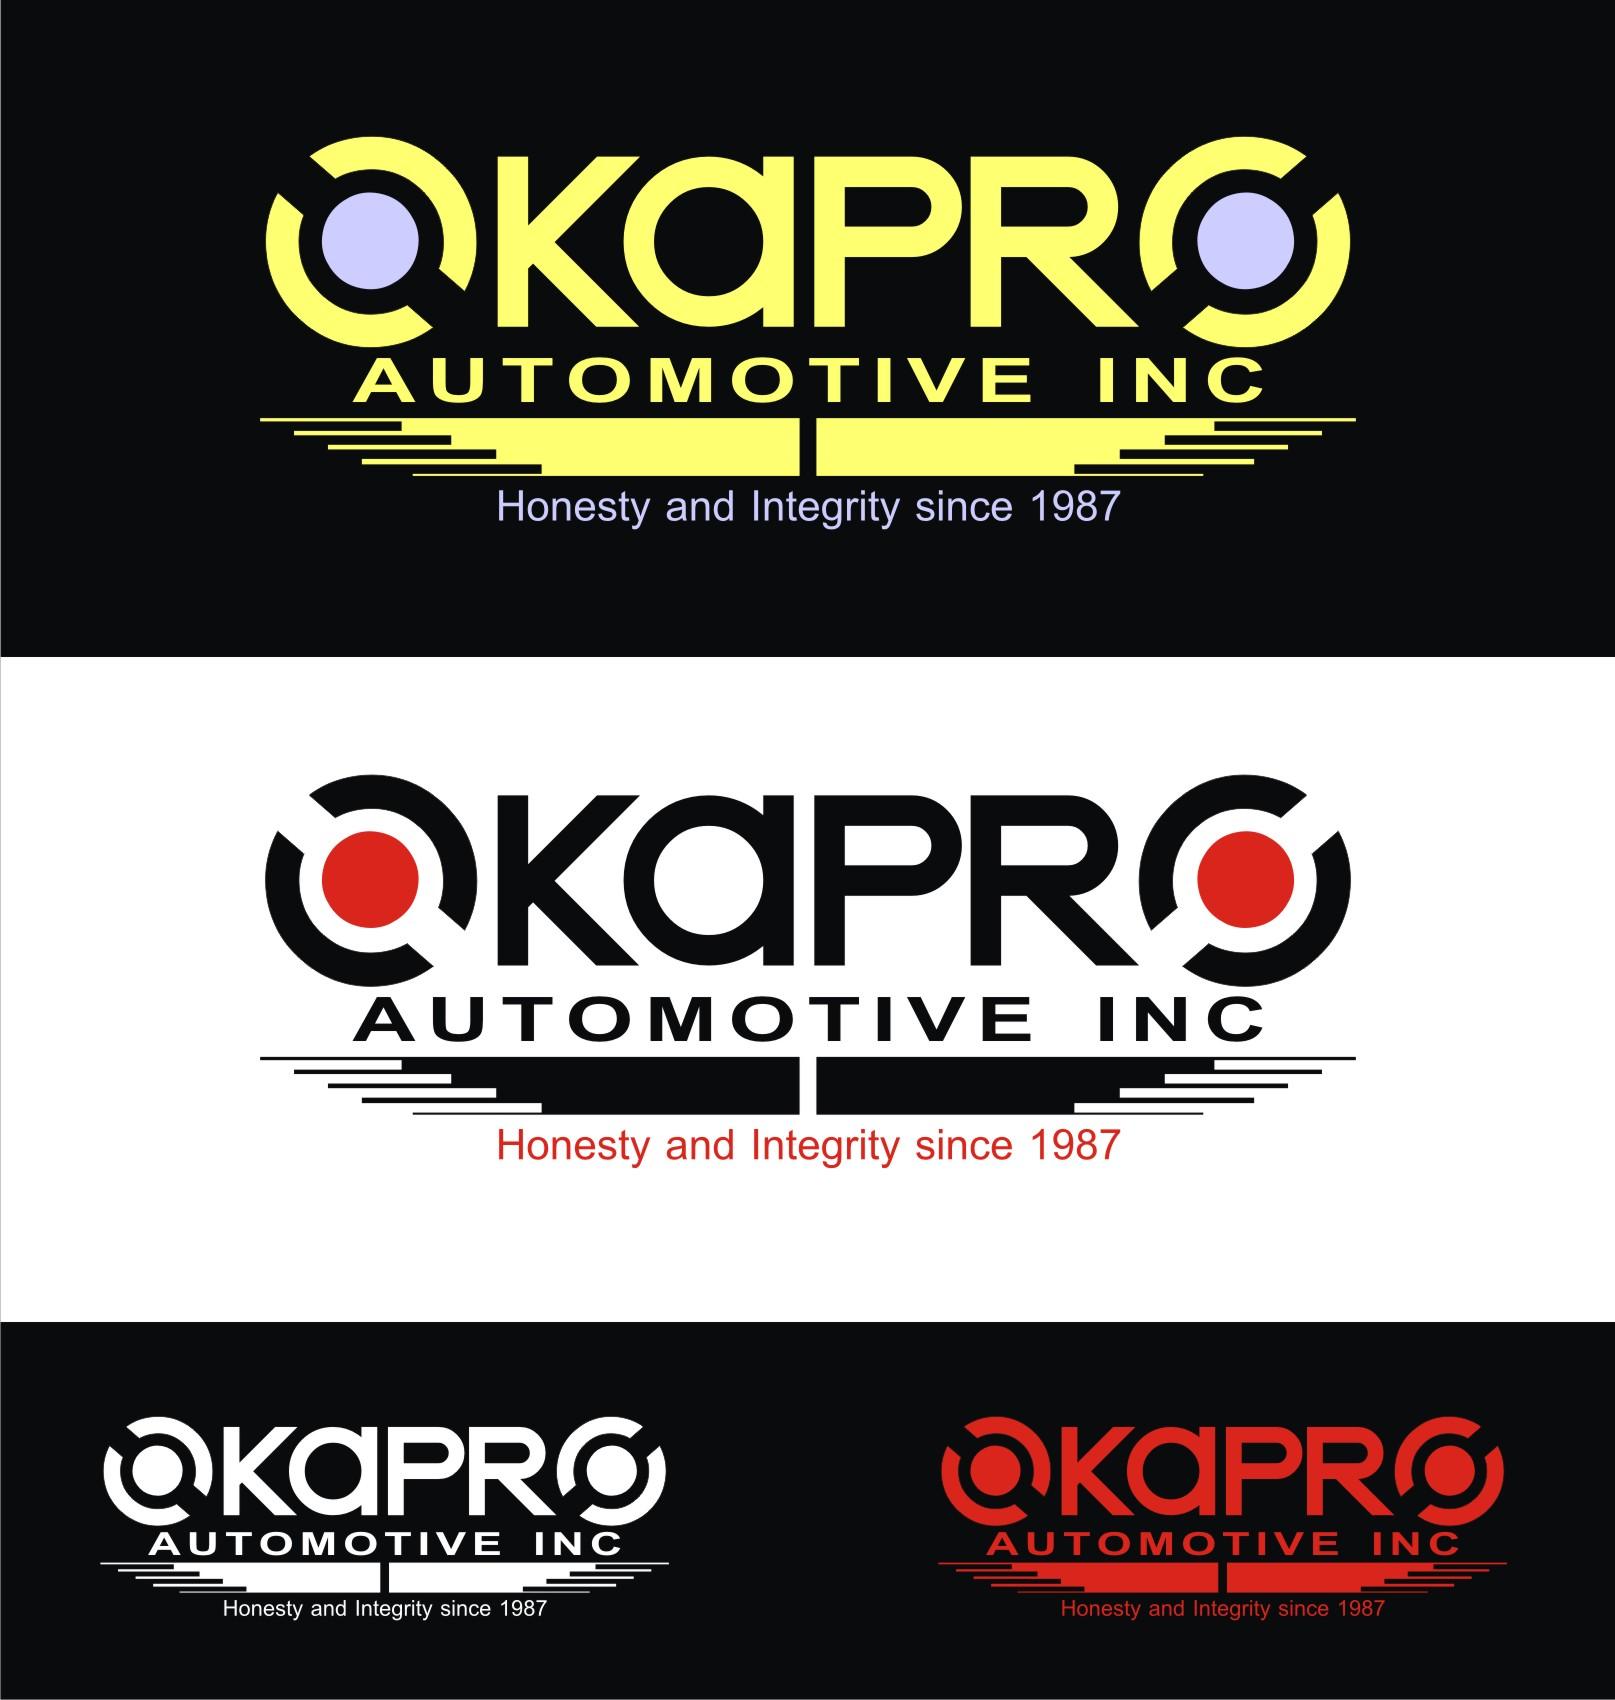 Logo Design by Private User - Entry No. 85 in the Logo Design Contest New Logo Design for Okapro  Automotive  Inc.